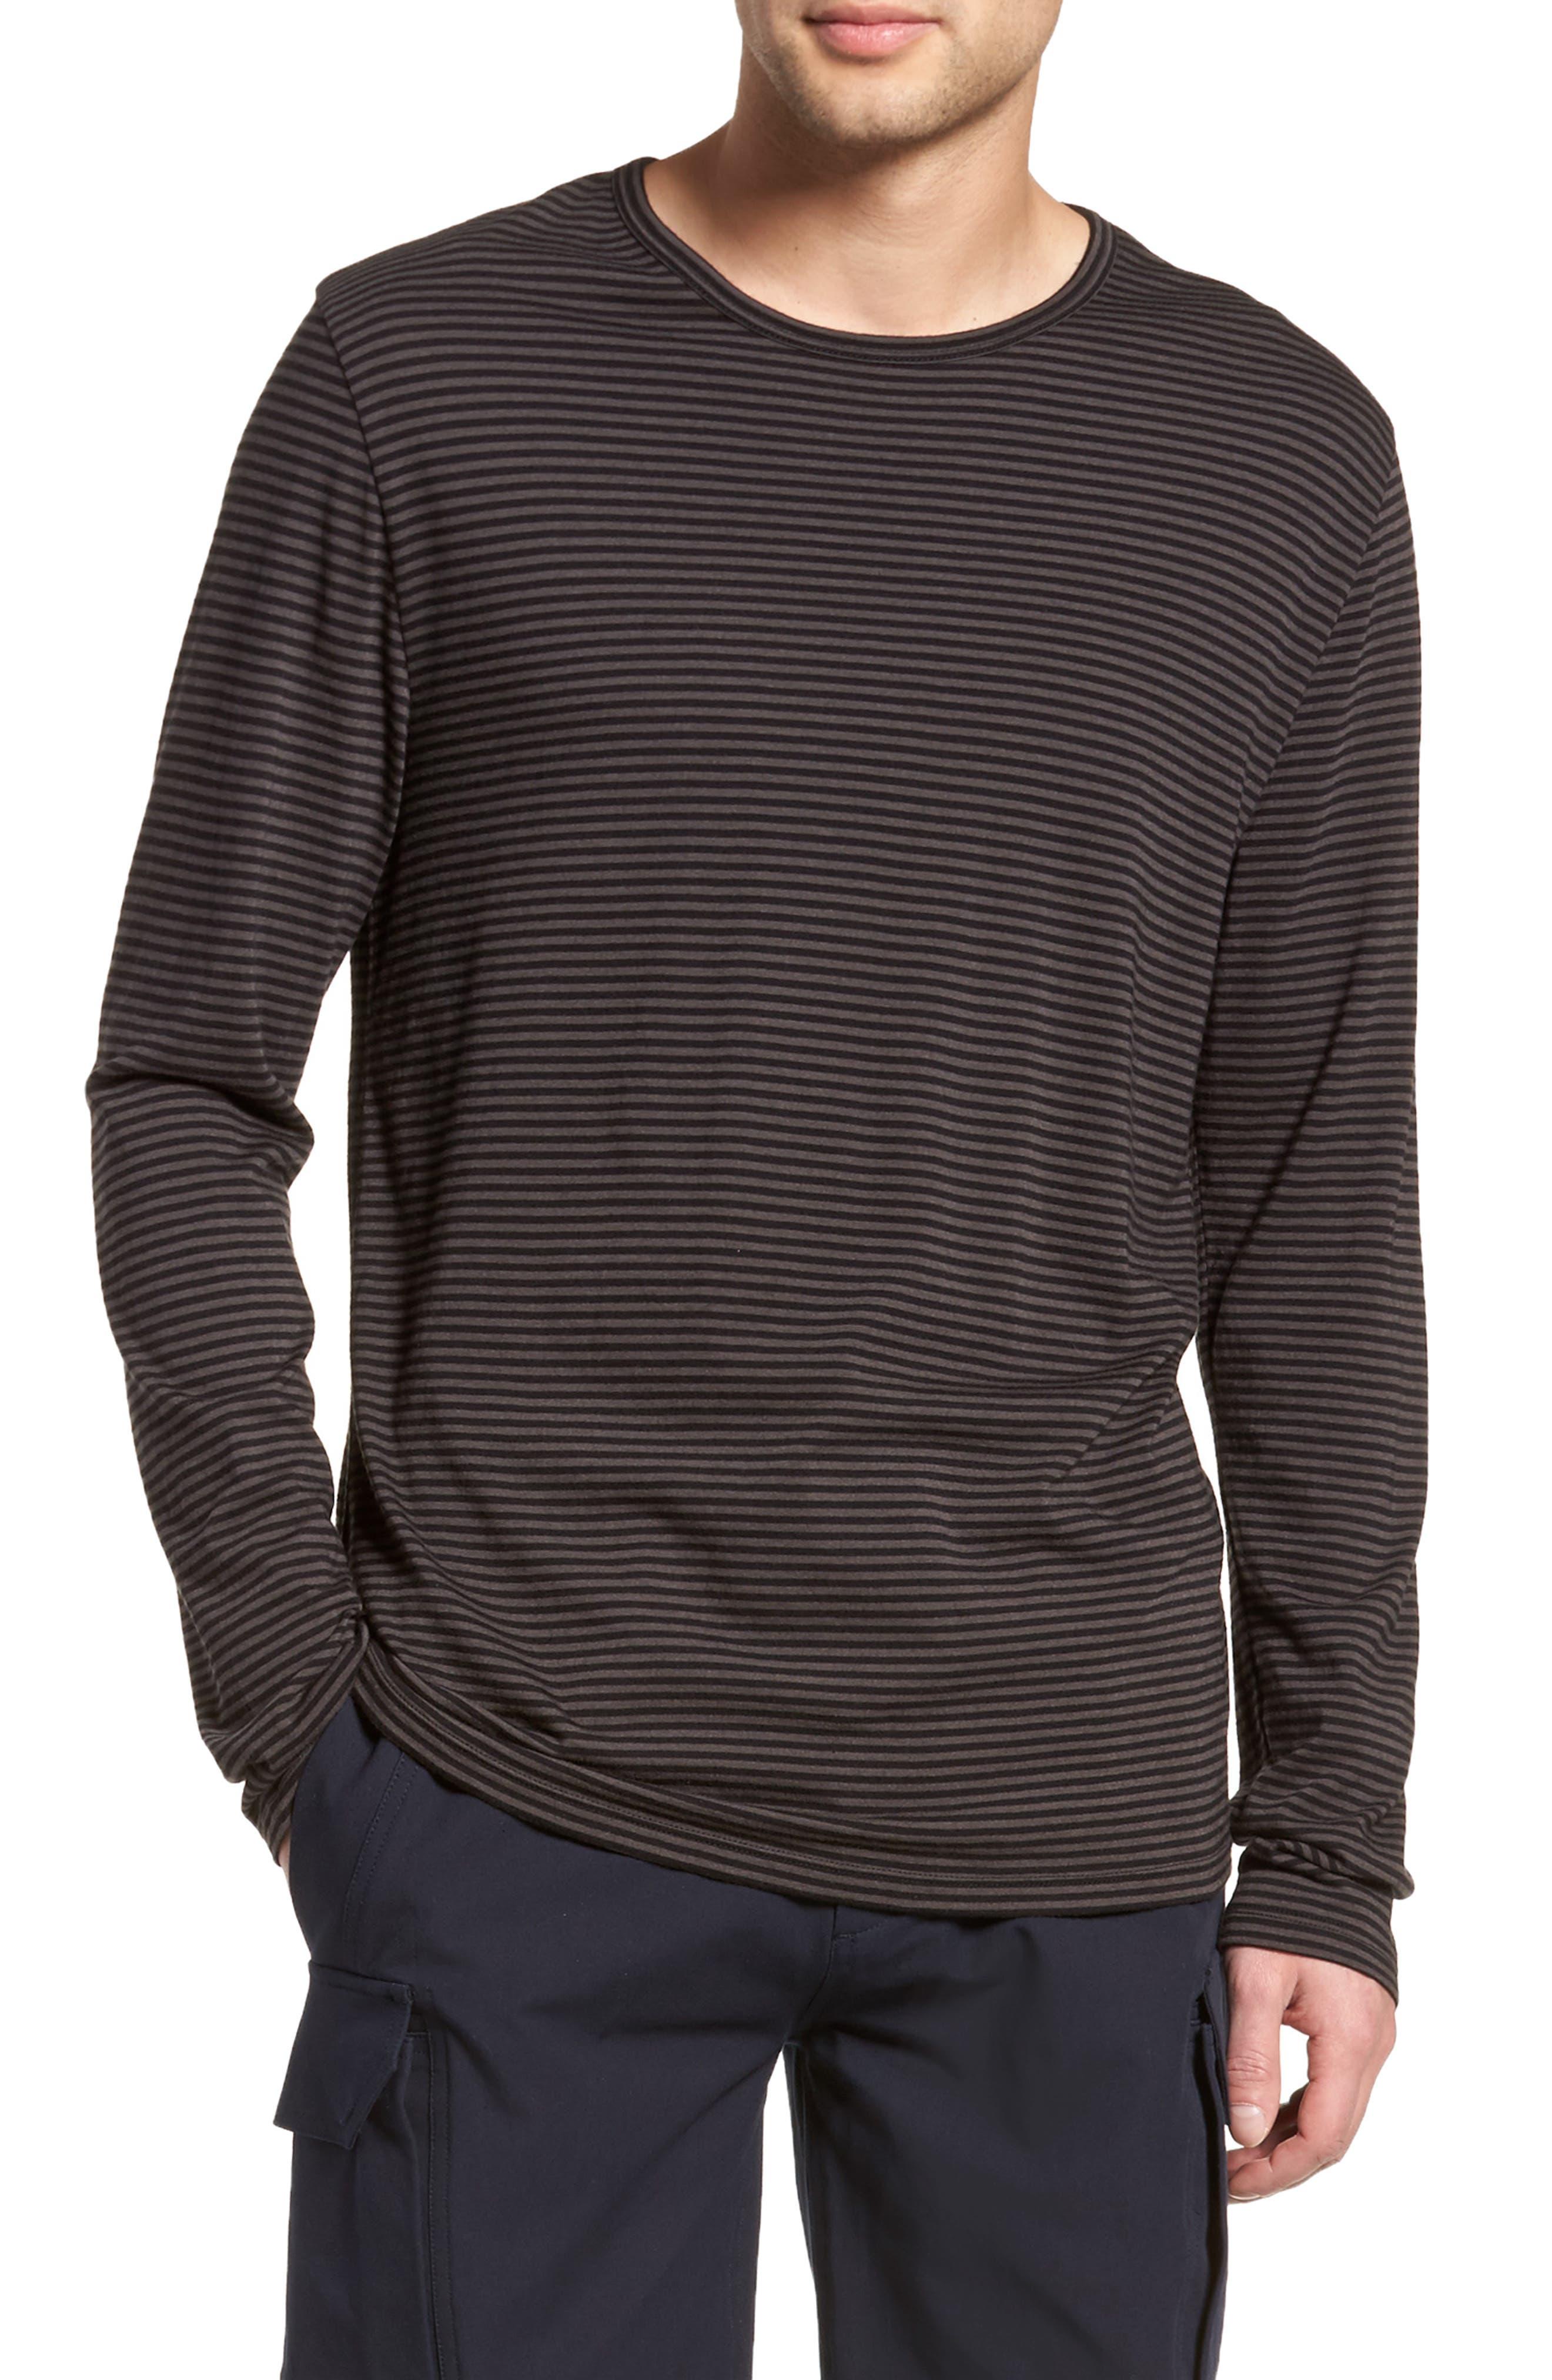 Feeder Stripe Long Sleeve Shirt,                             Main thumbnail 1, color,                             Black/ Stone Grey